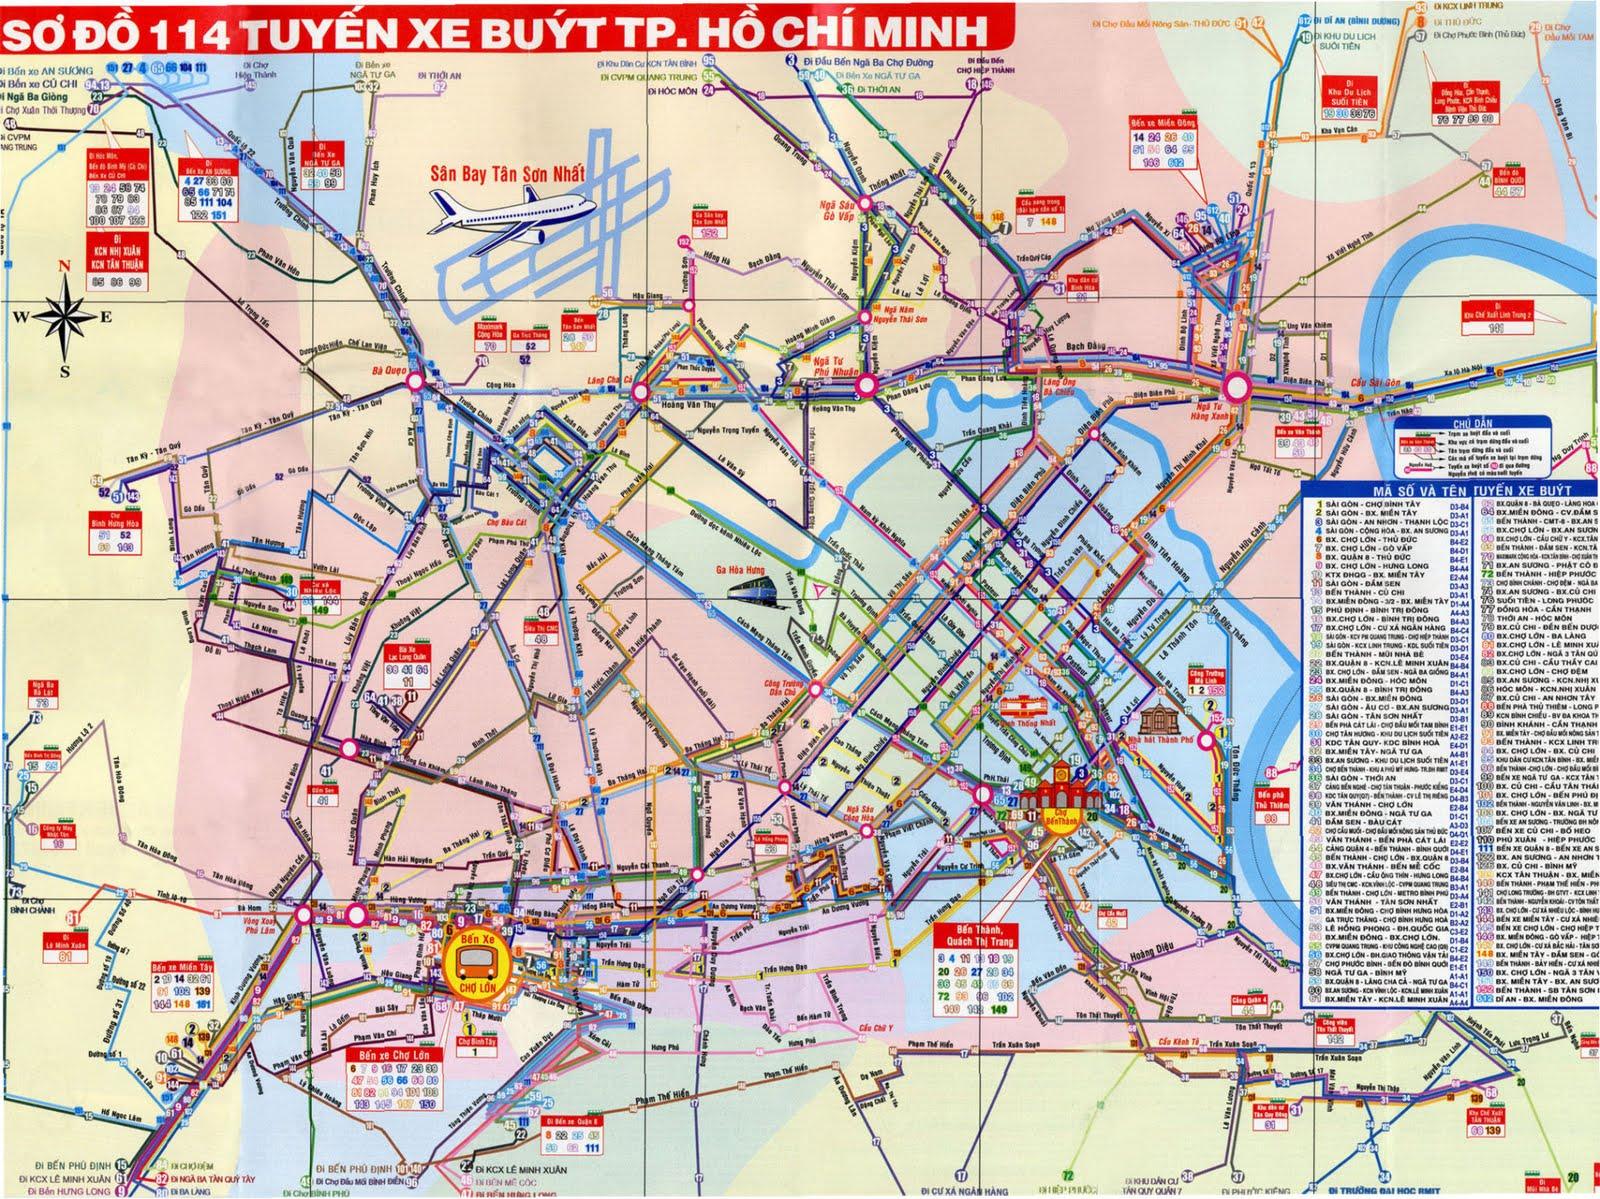 Ho Chi Minh City Map Saigon Map   Tourist map, city map and street map of Ho Chi Minh  Ho Chi Minh City Map